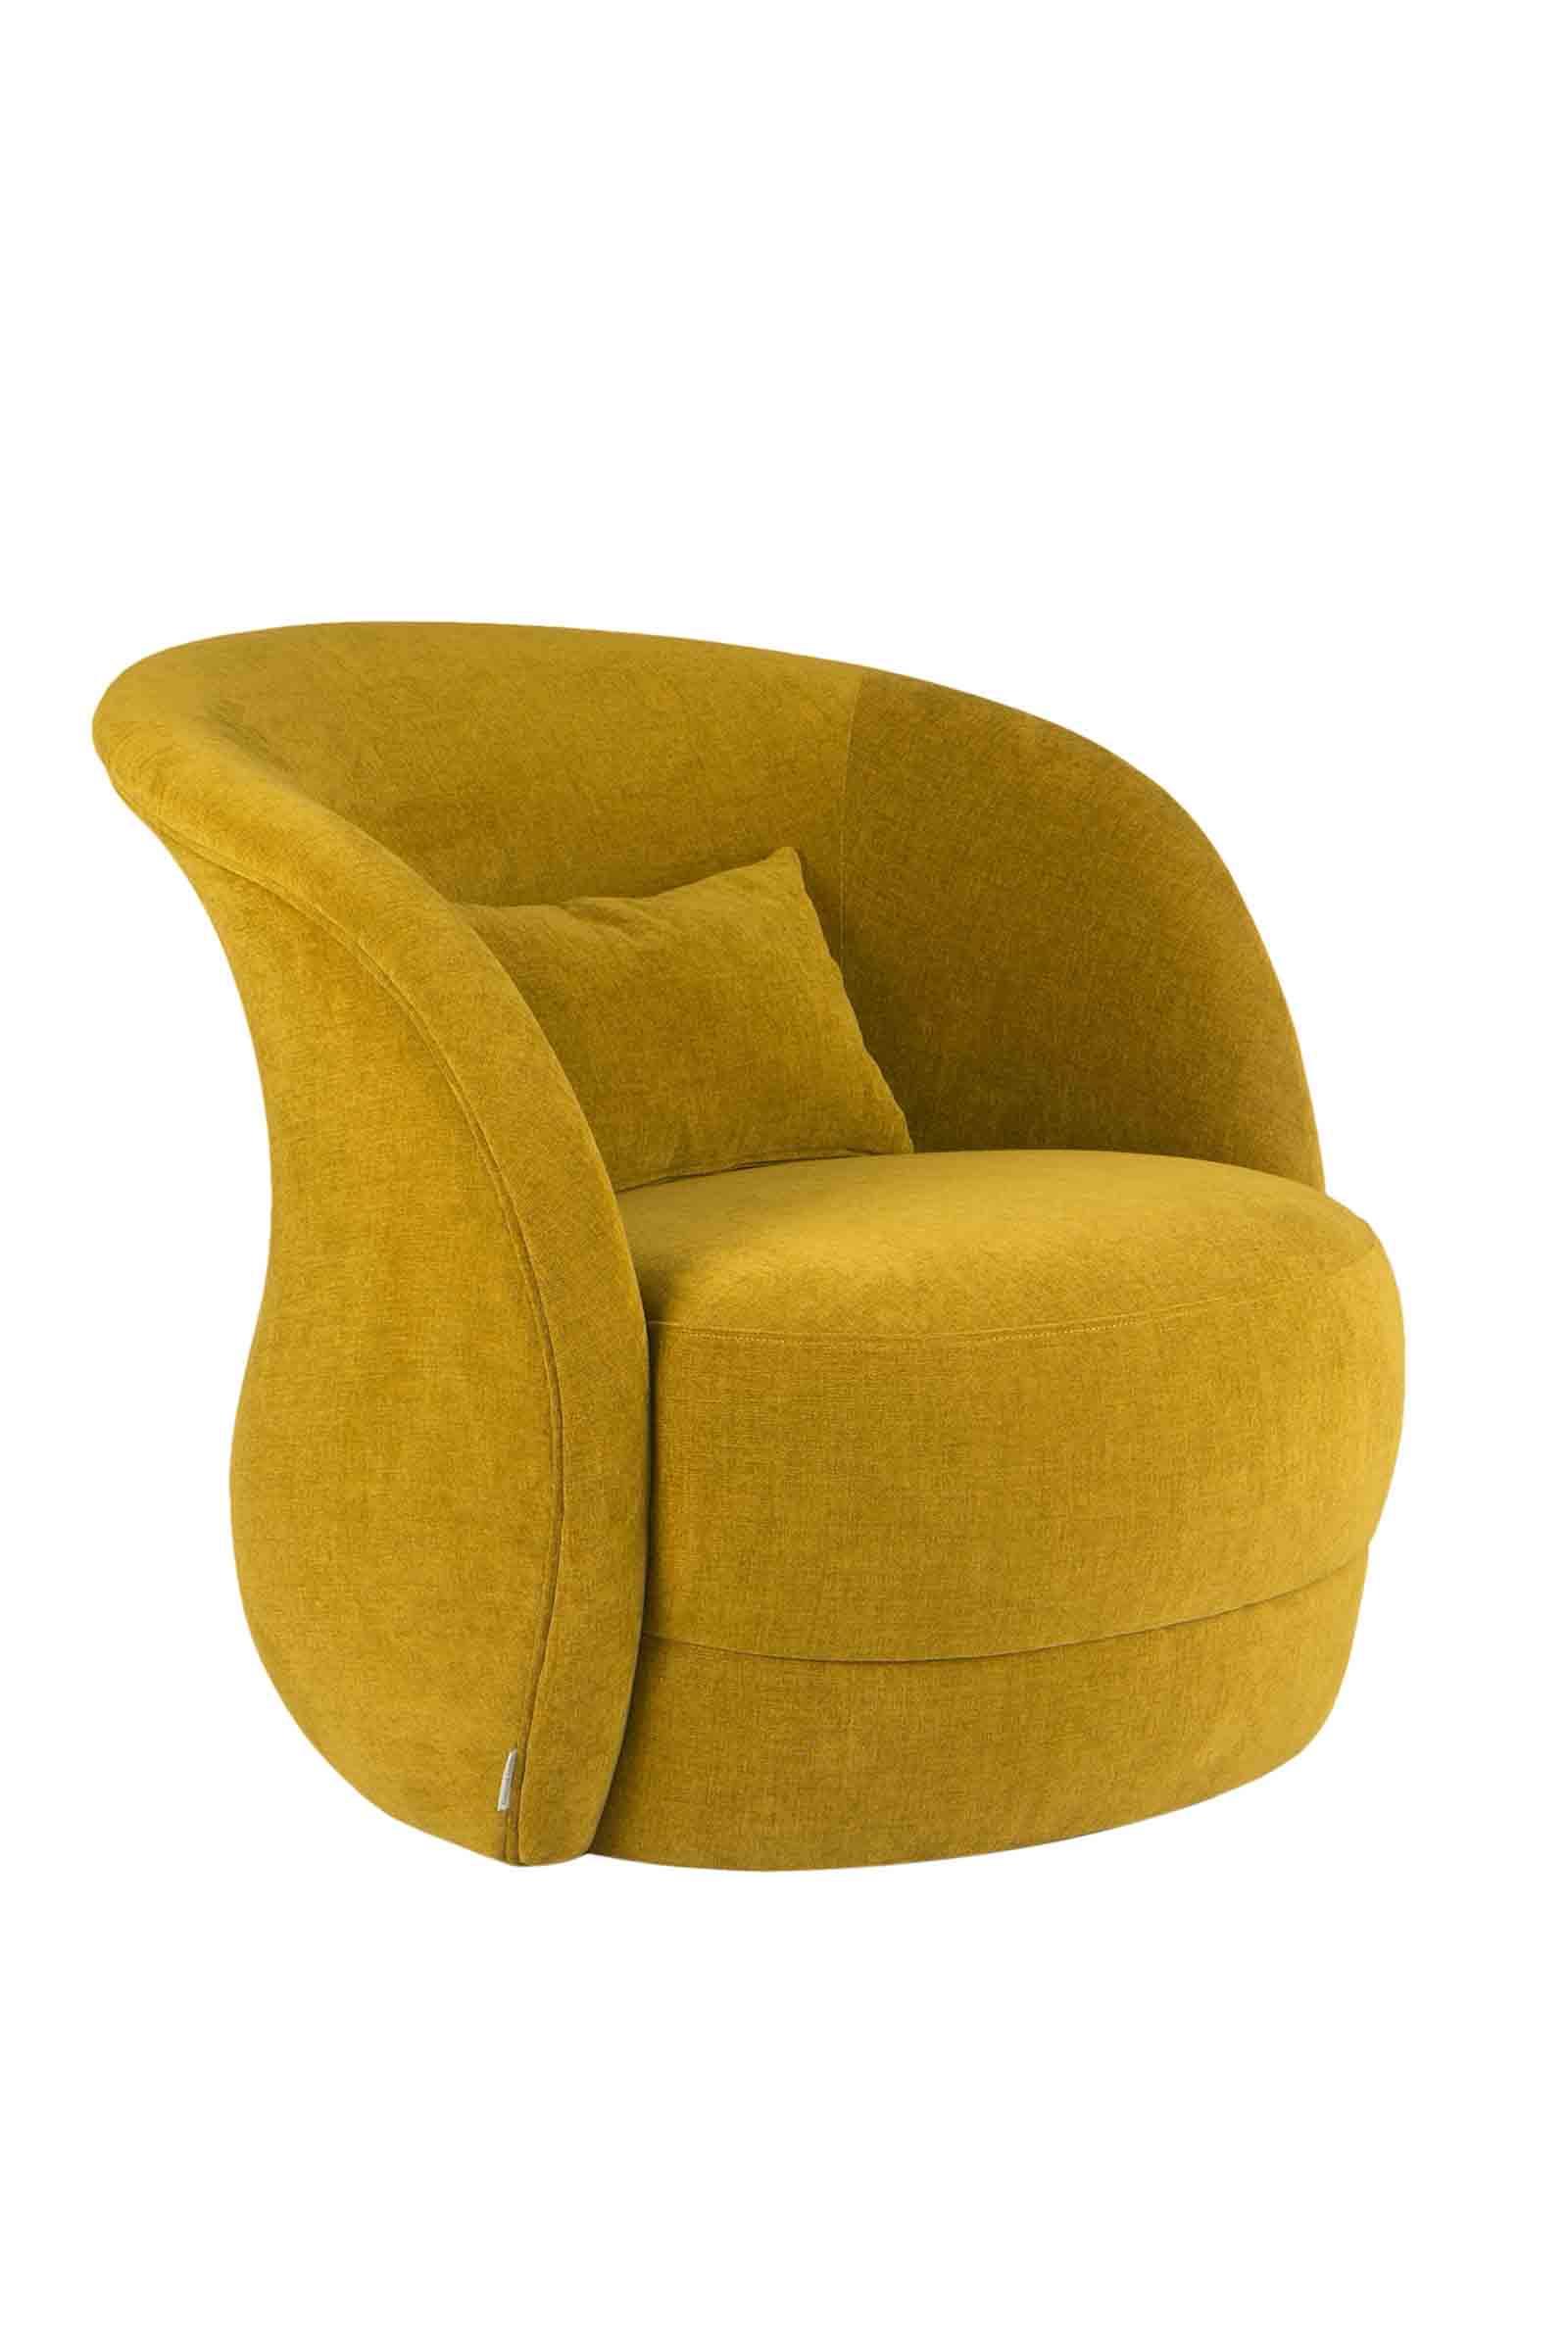 'Laura' chair from Hamilton Conte